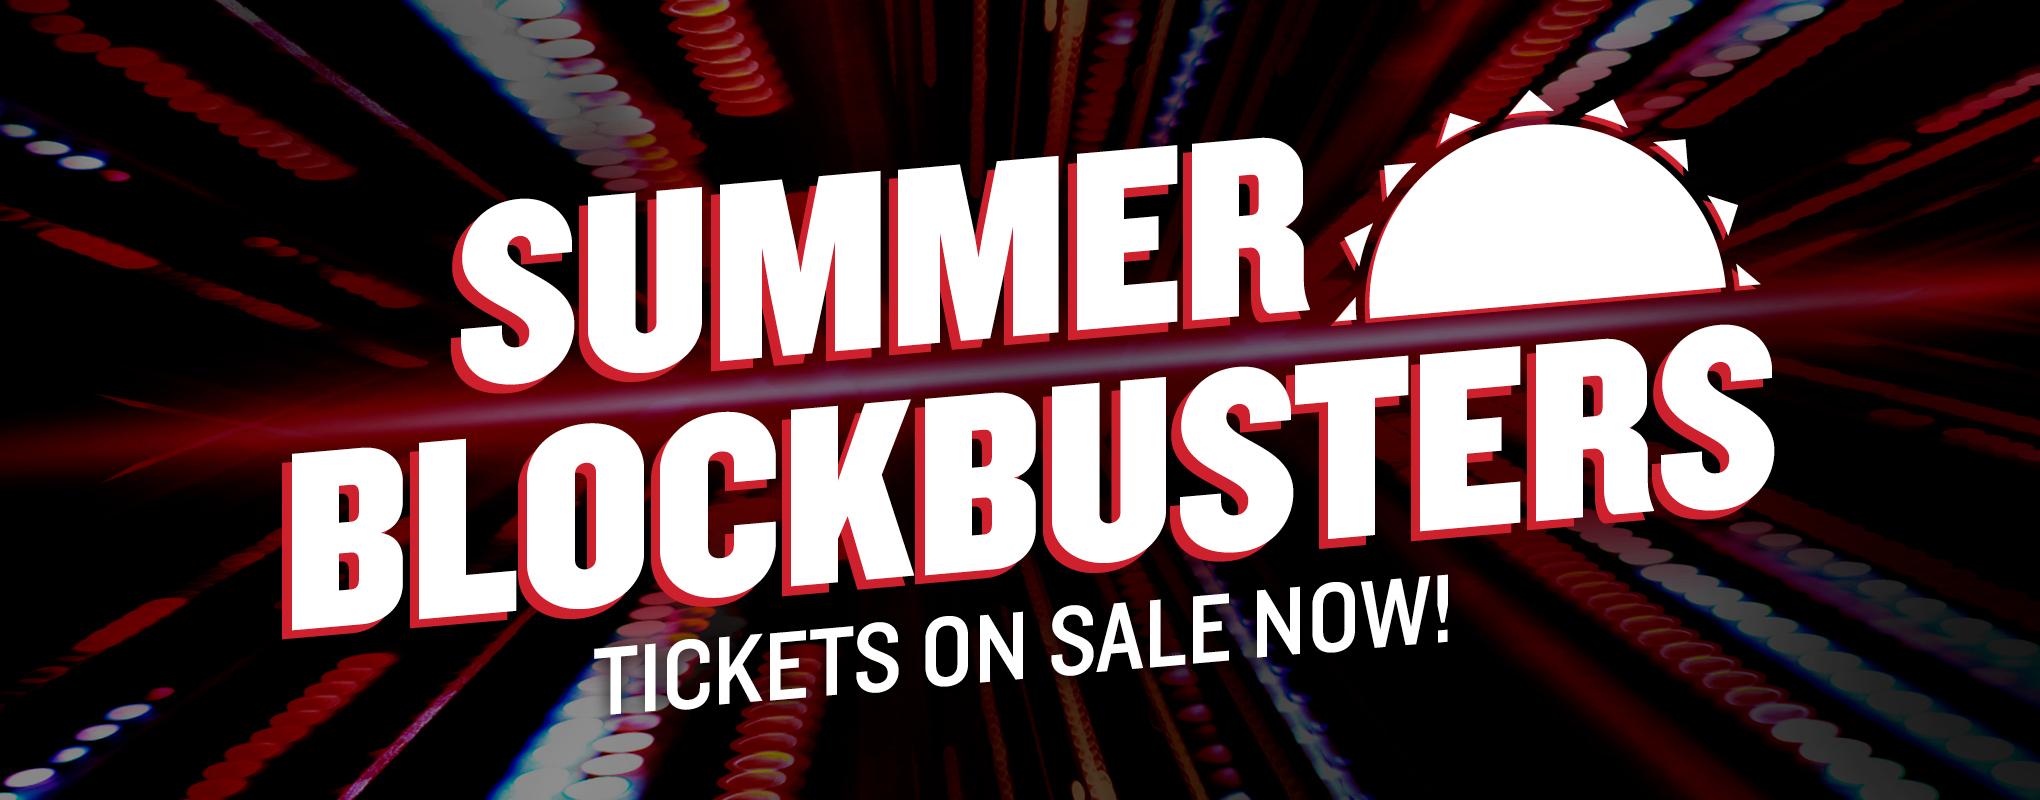 Summer Blockbuster Tickets On Sale